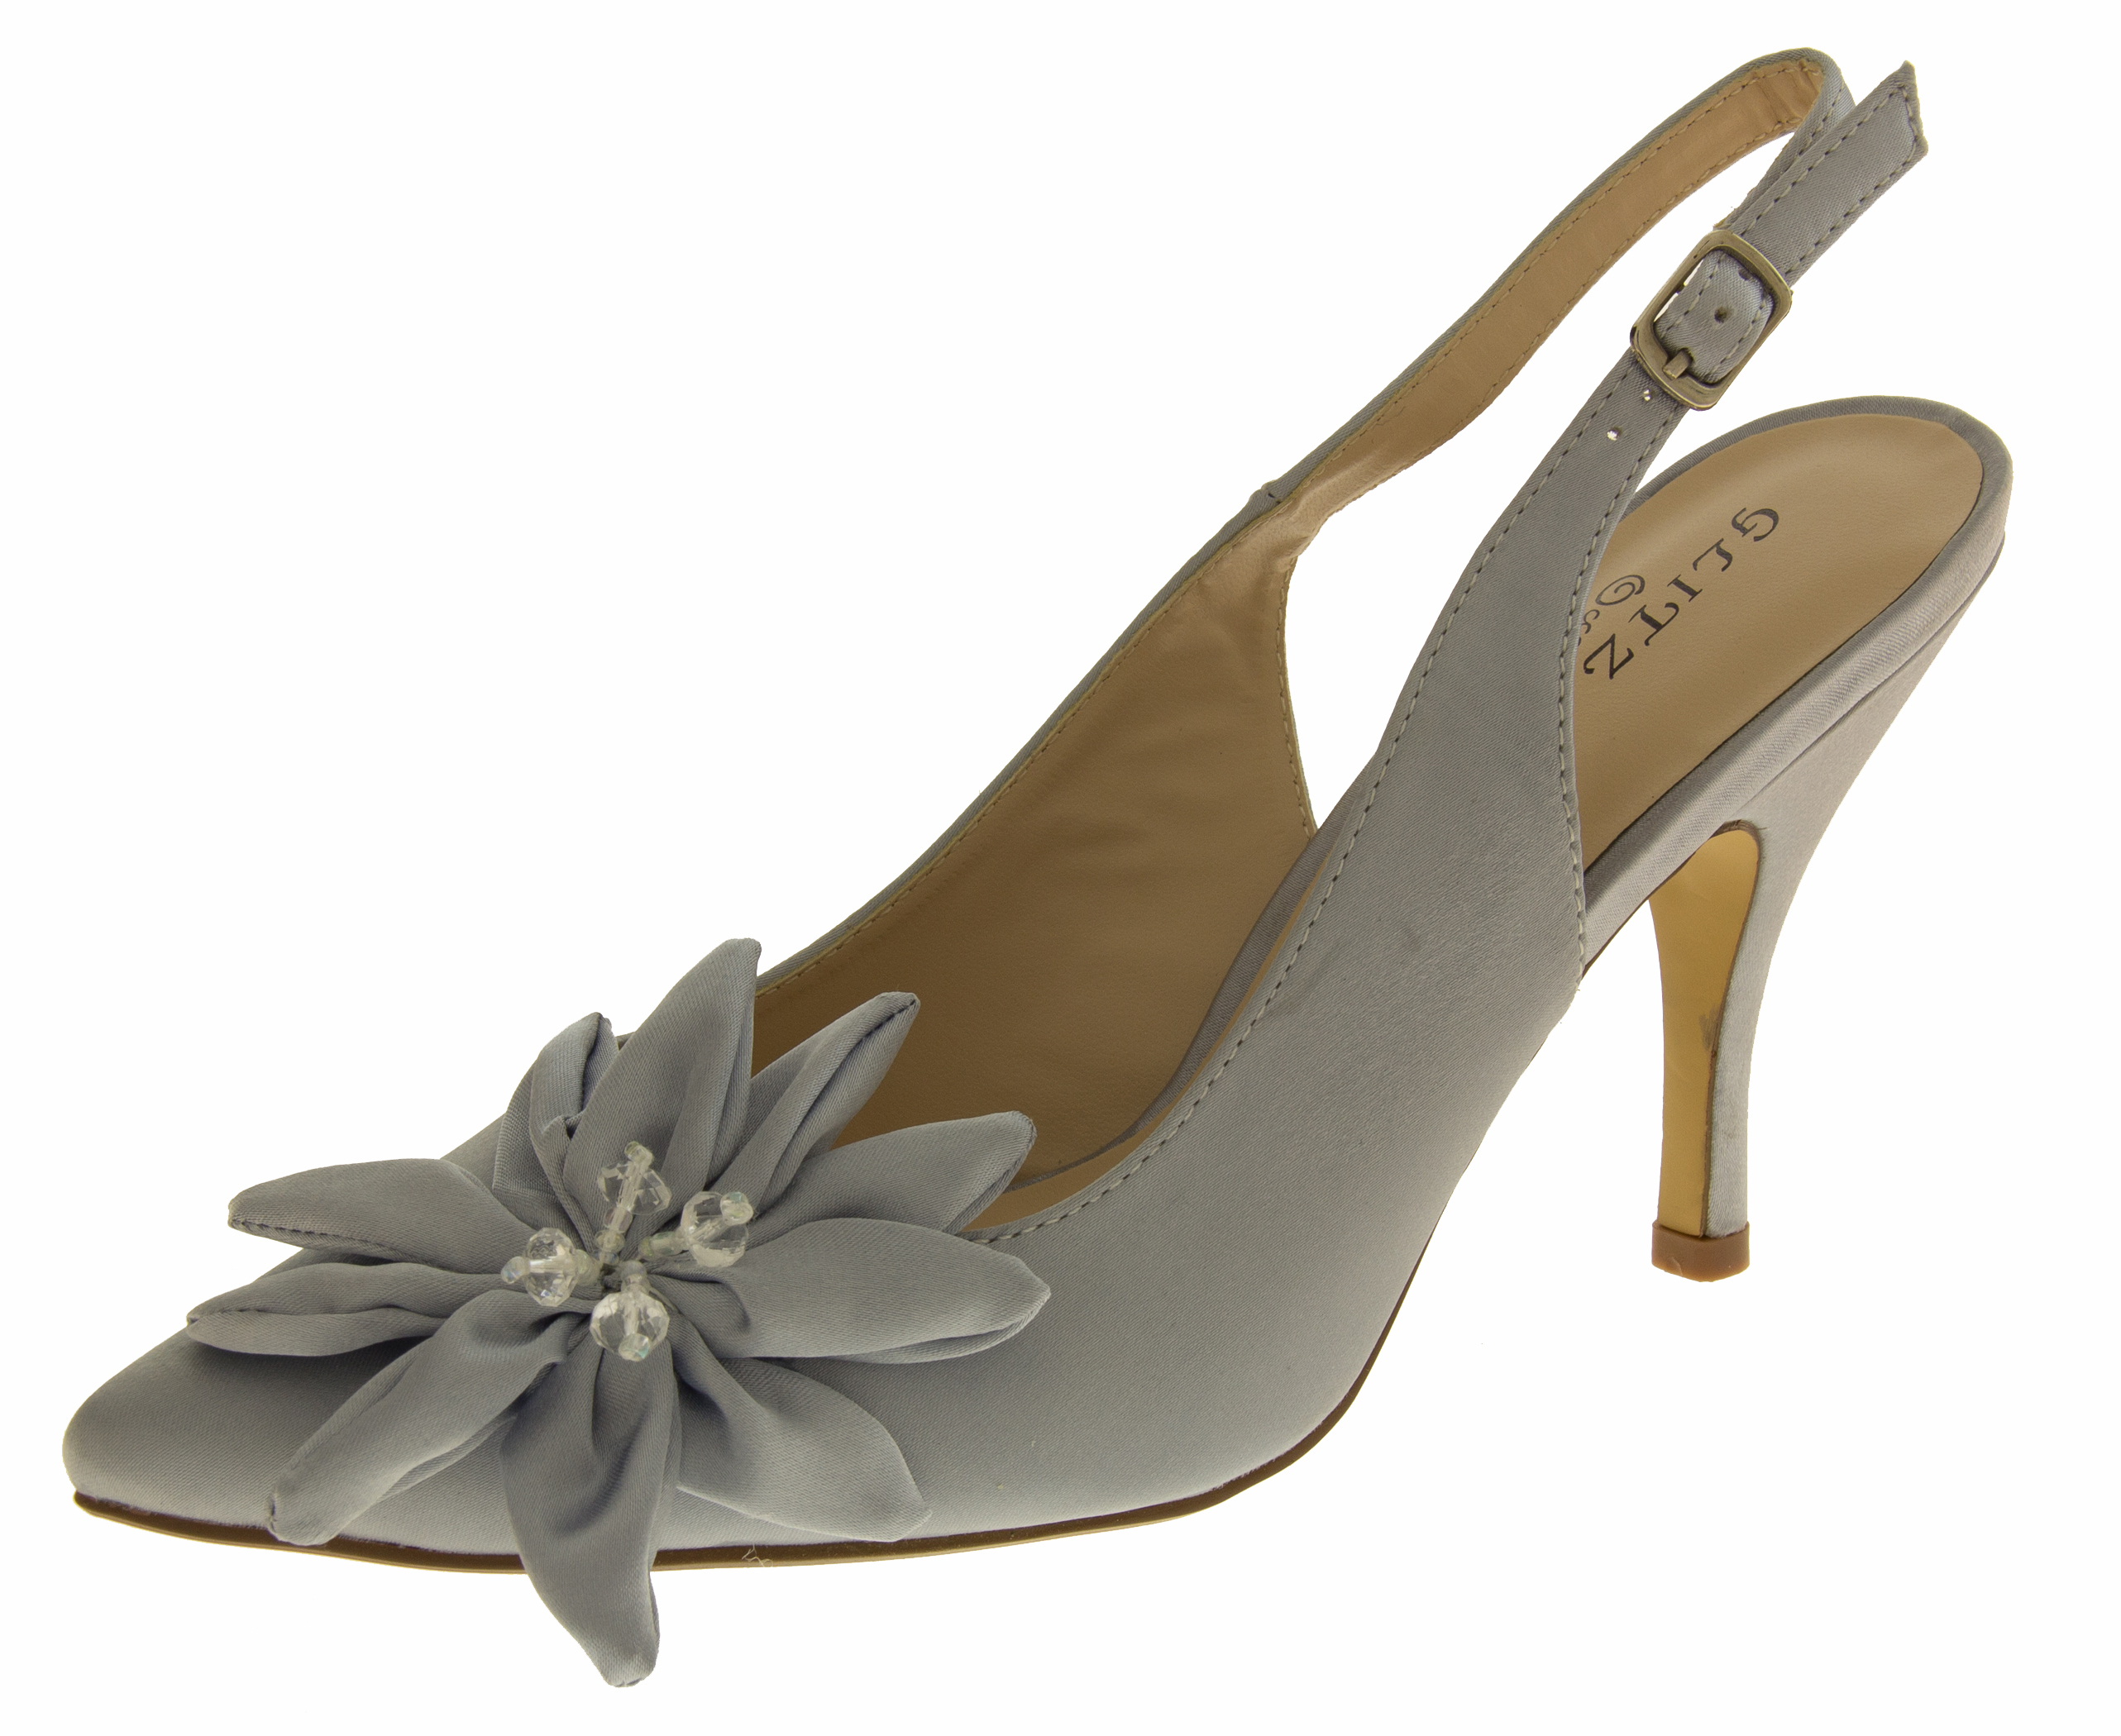 womens wedding shoes bridal satin mid high heels. Black Bedroom Furniture Sets. Home Design Ideas